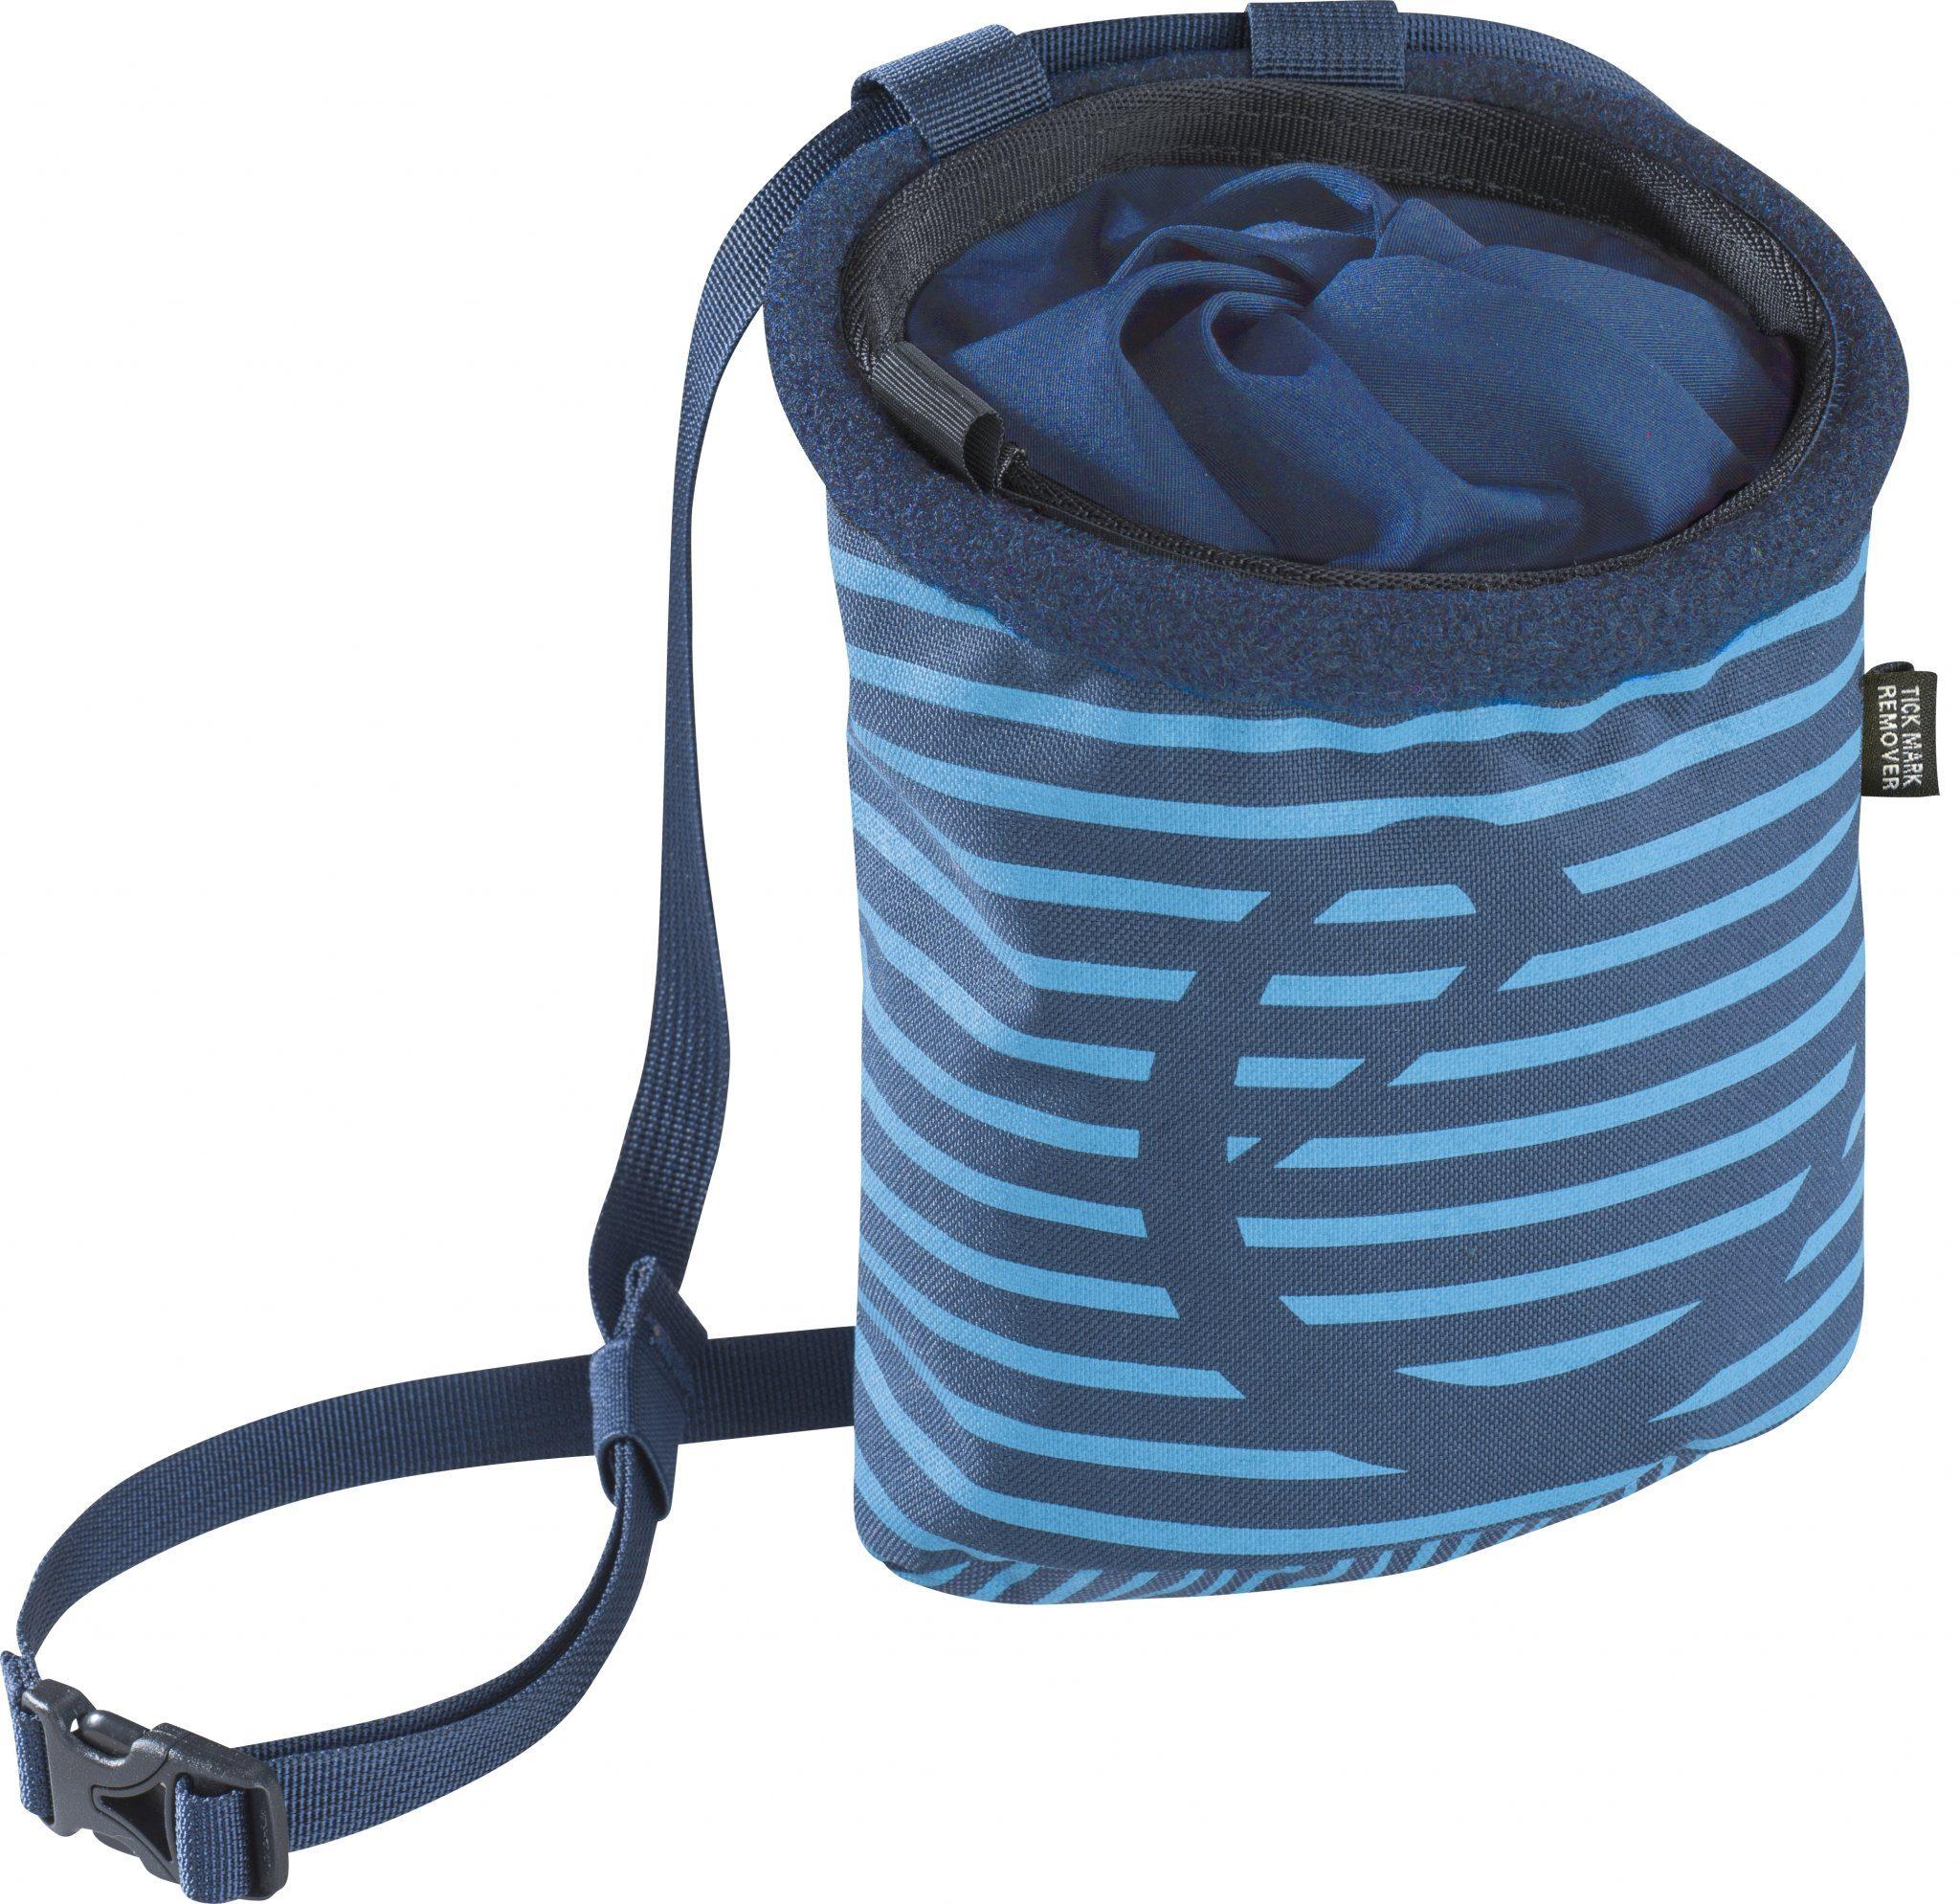 Edelrid Chalkbag »Rocket Twist Chalk Bag«